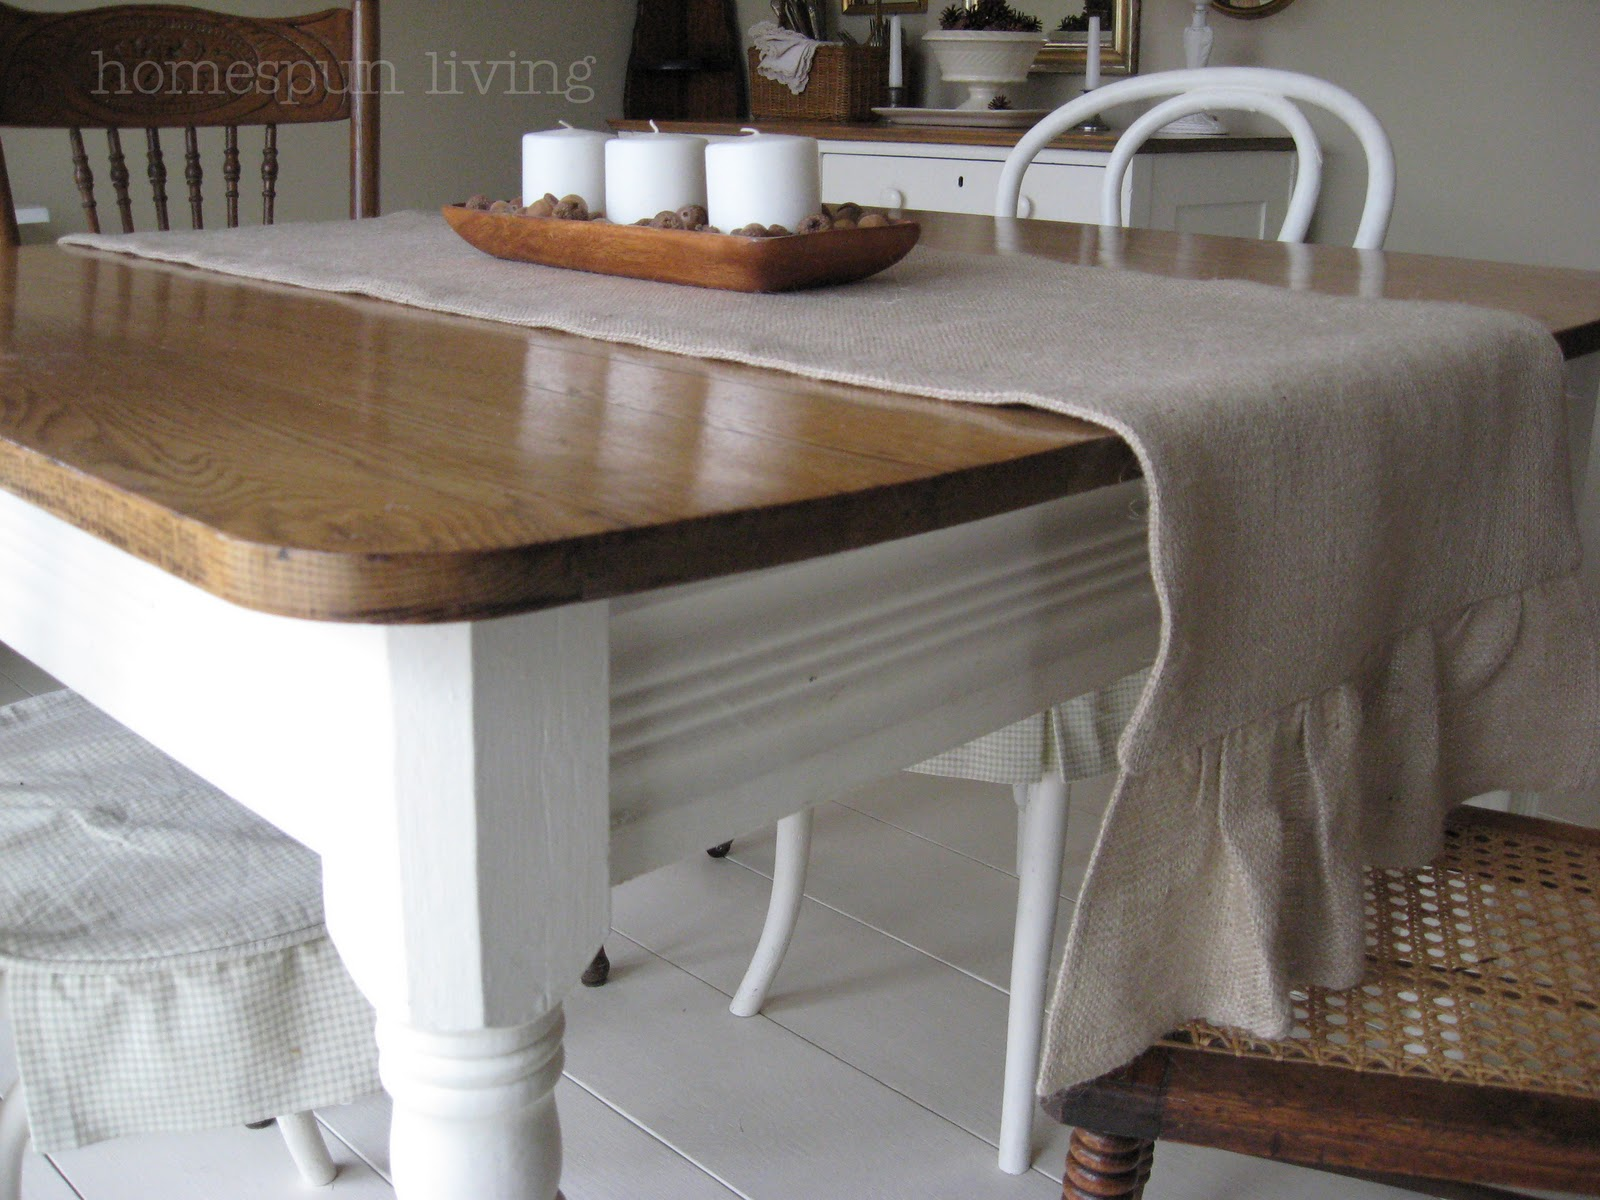 Homespun living a table runner for the dining room